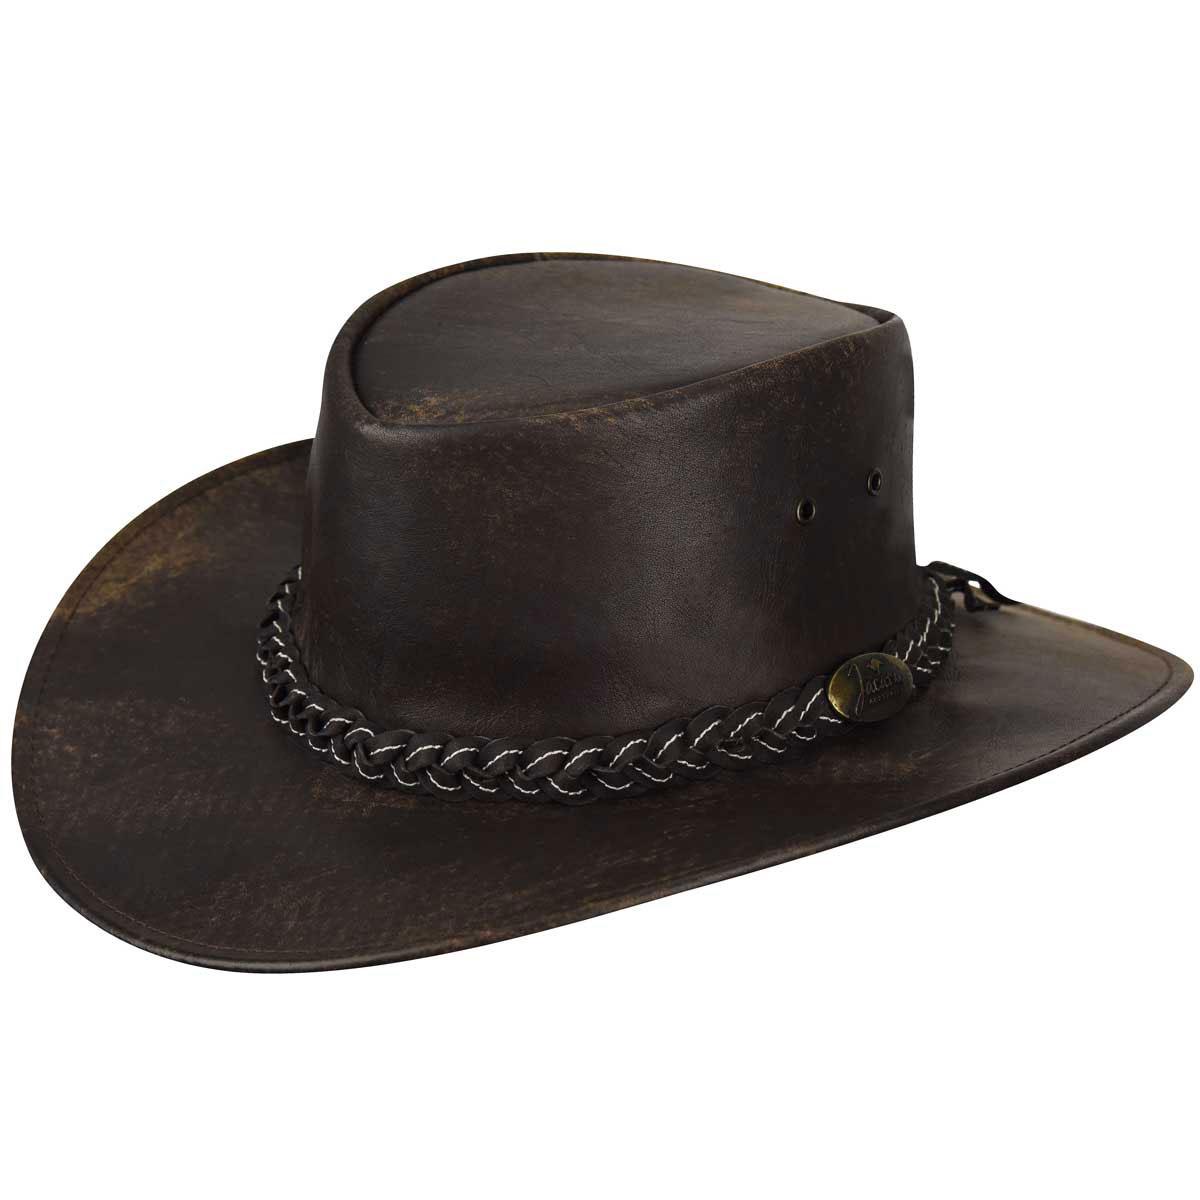 Jacaru Kangaroo Stonewashed Outback Hat in Stonewash